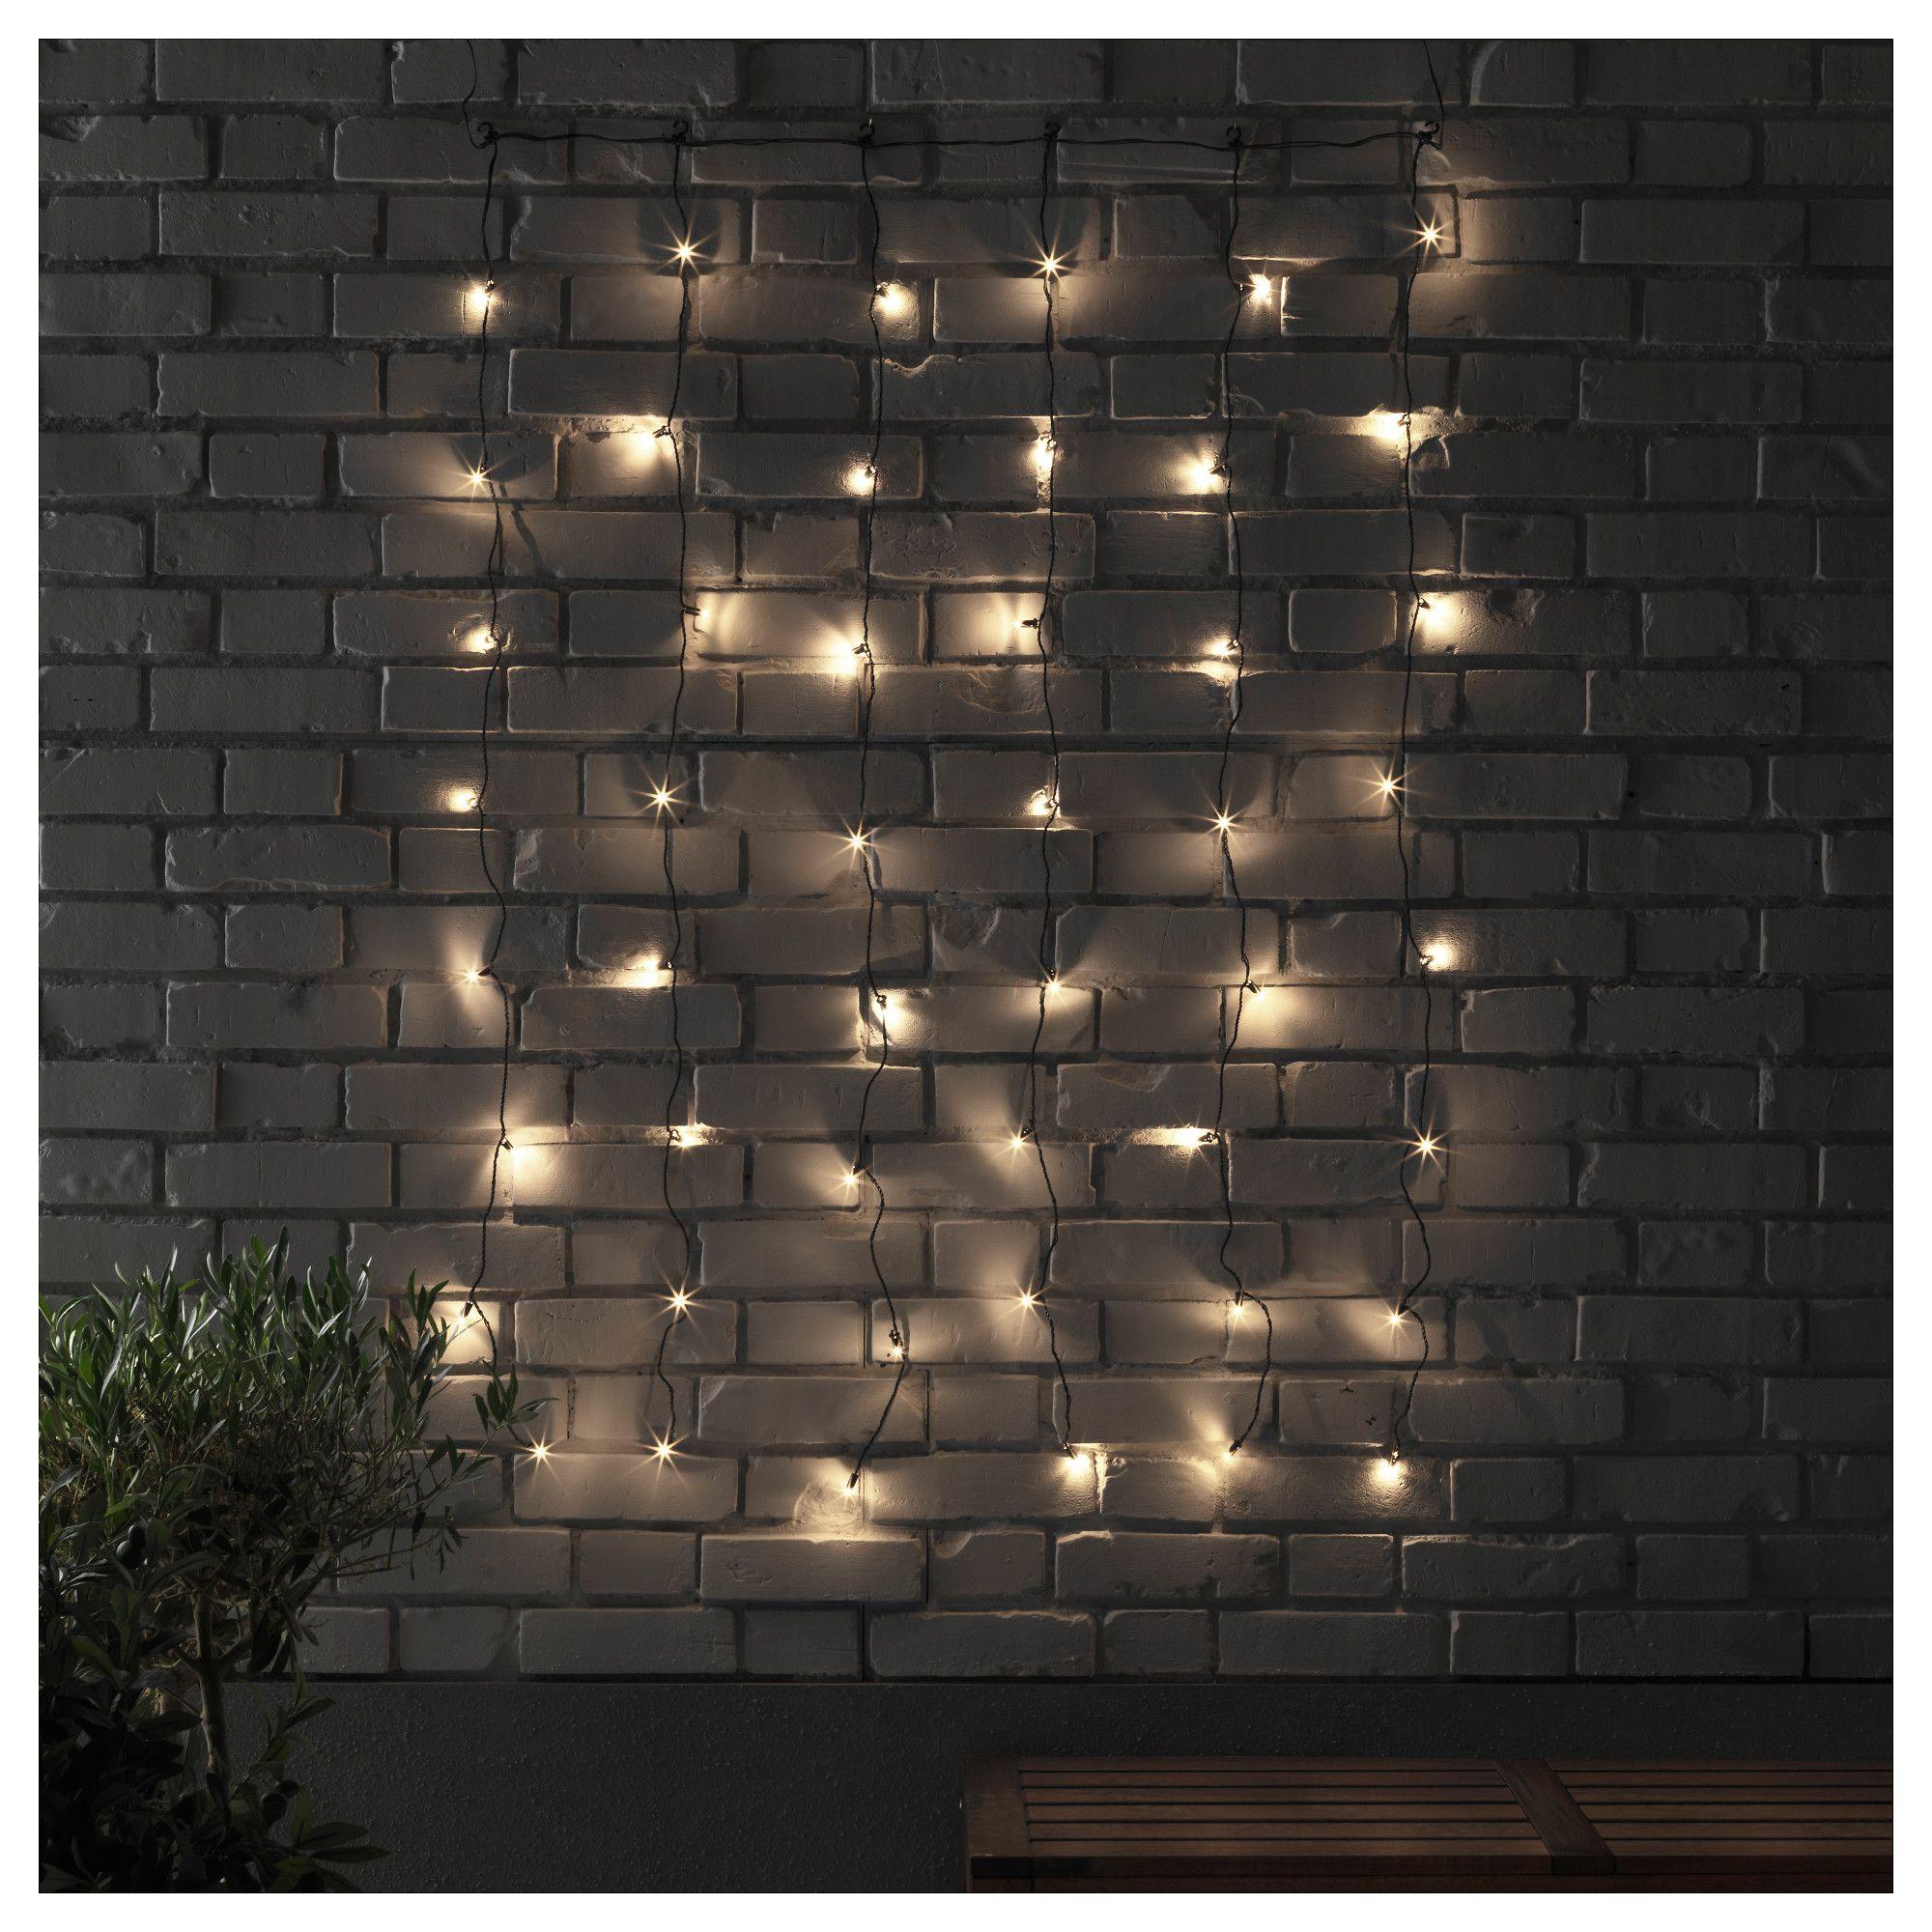 Ikea Skruv Led Lighting Curtain With 48 Lights